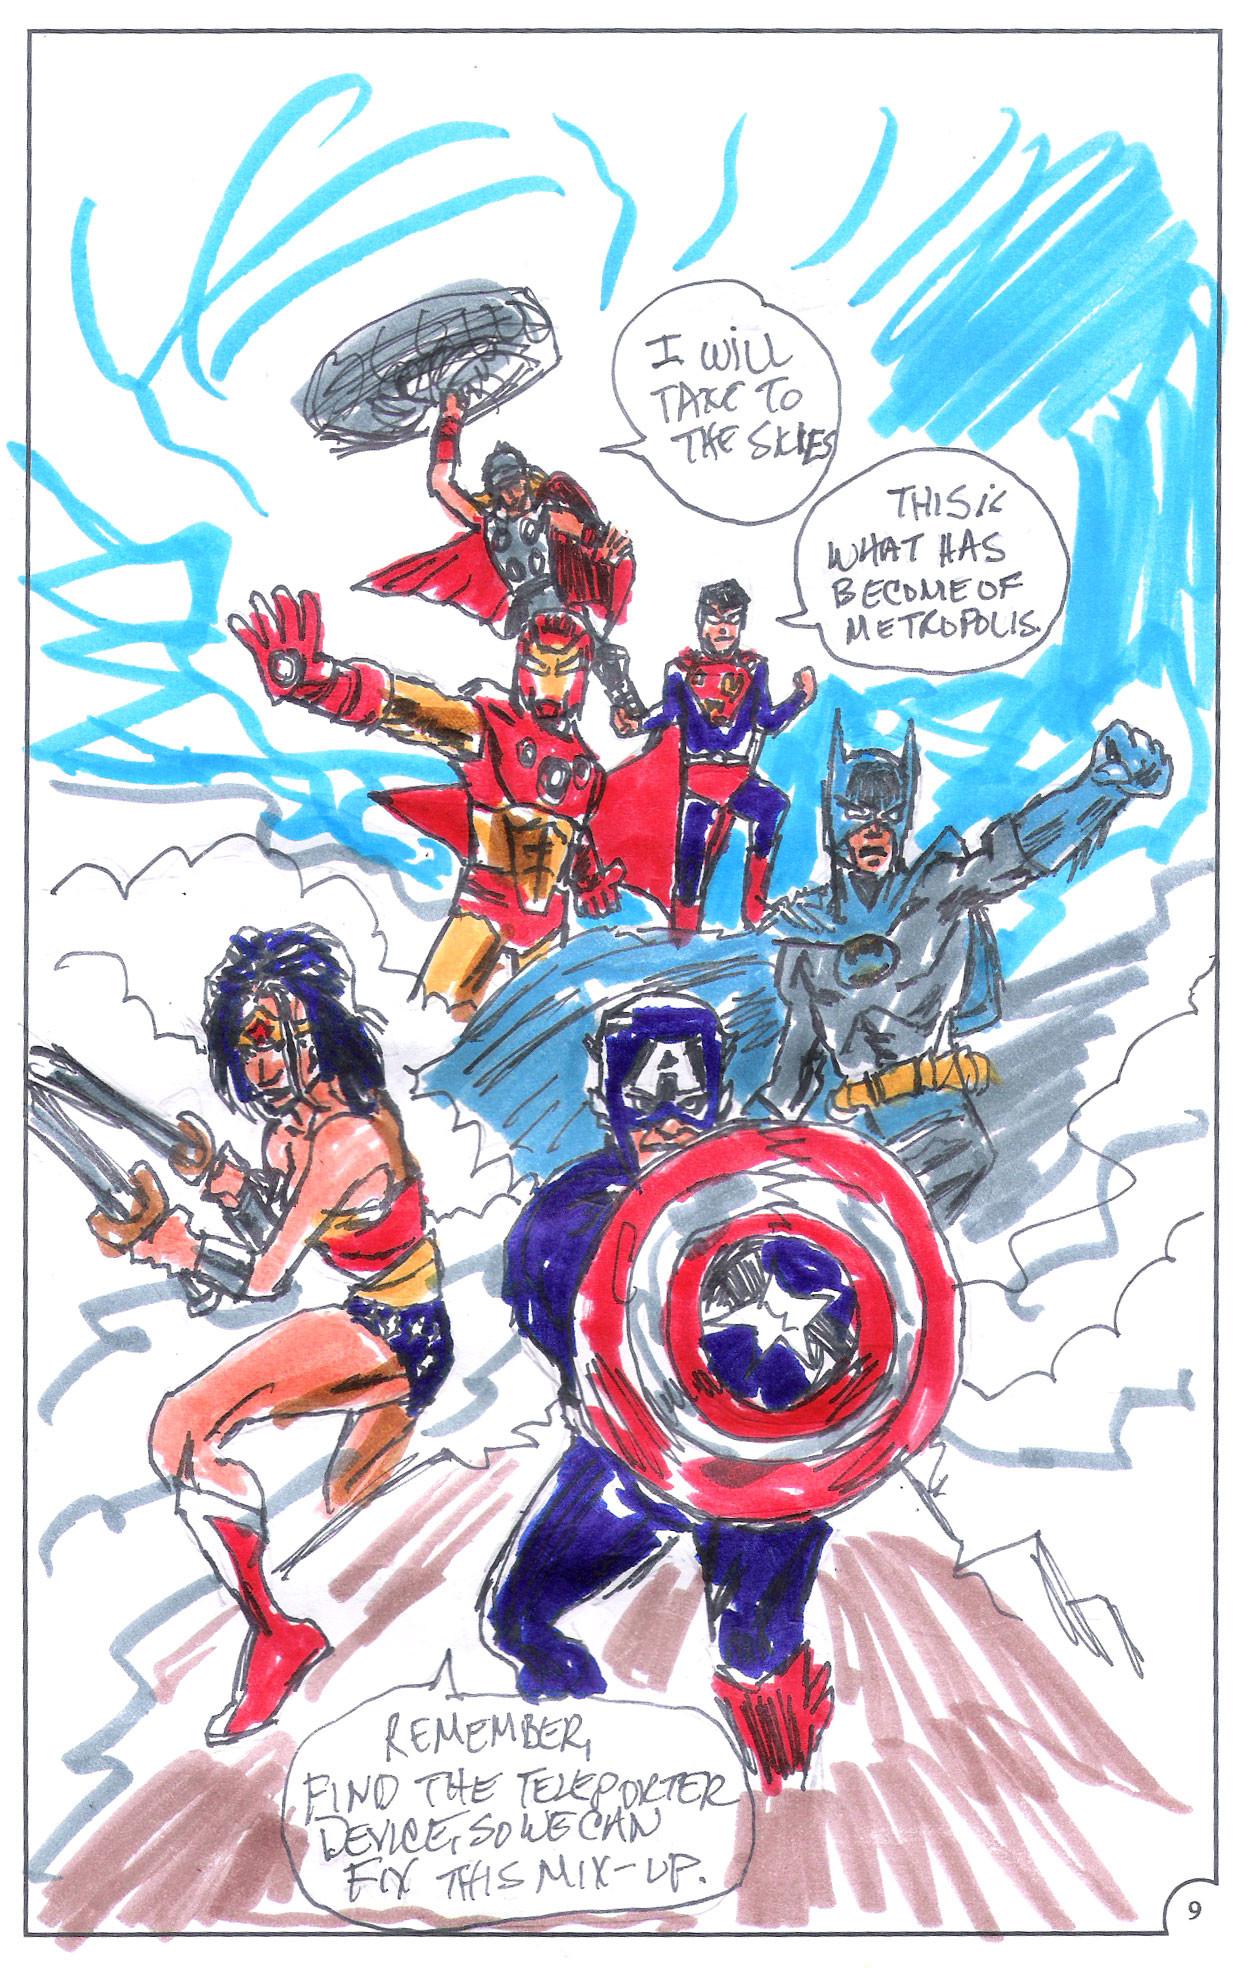 ArtStation - ultimate justice page marvel dc fanfiction art